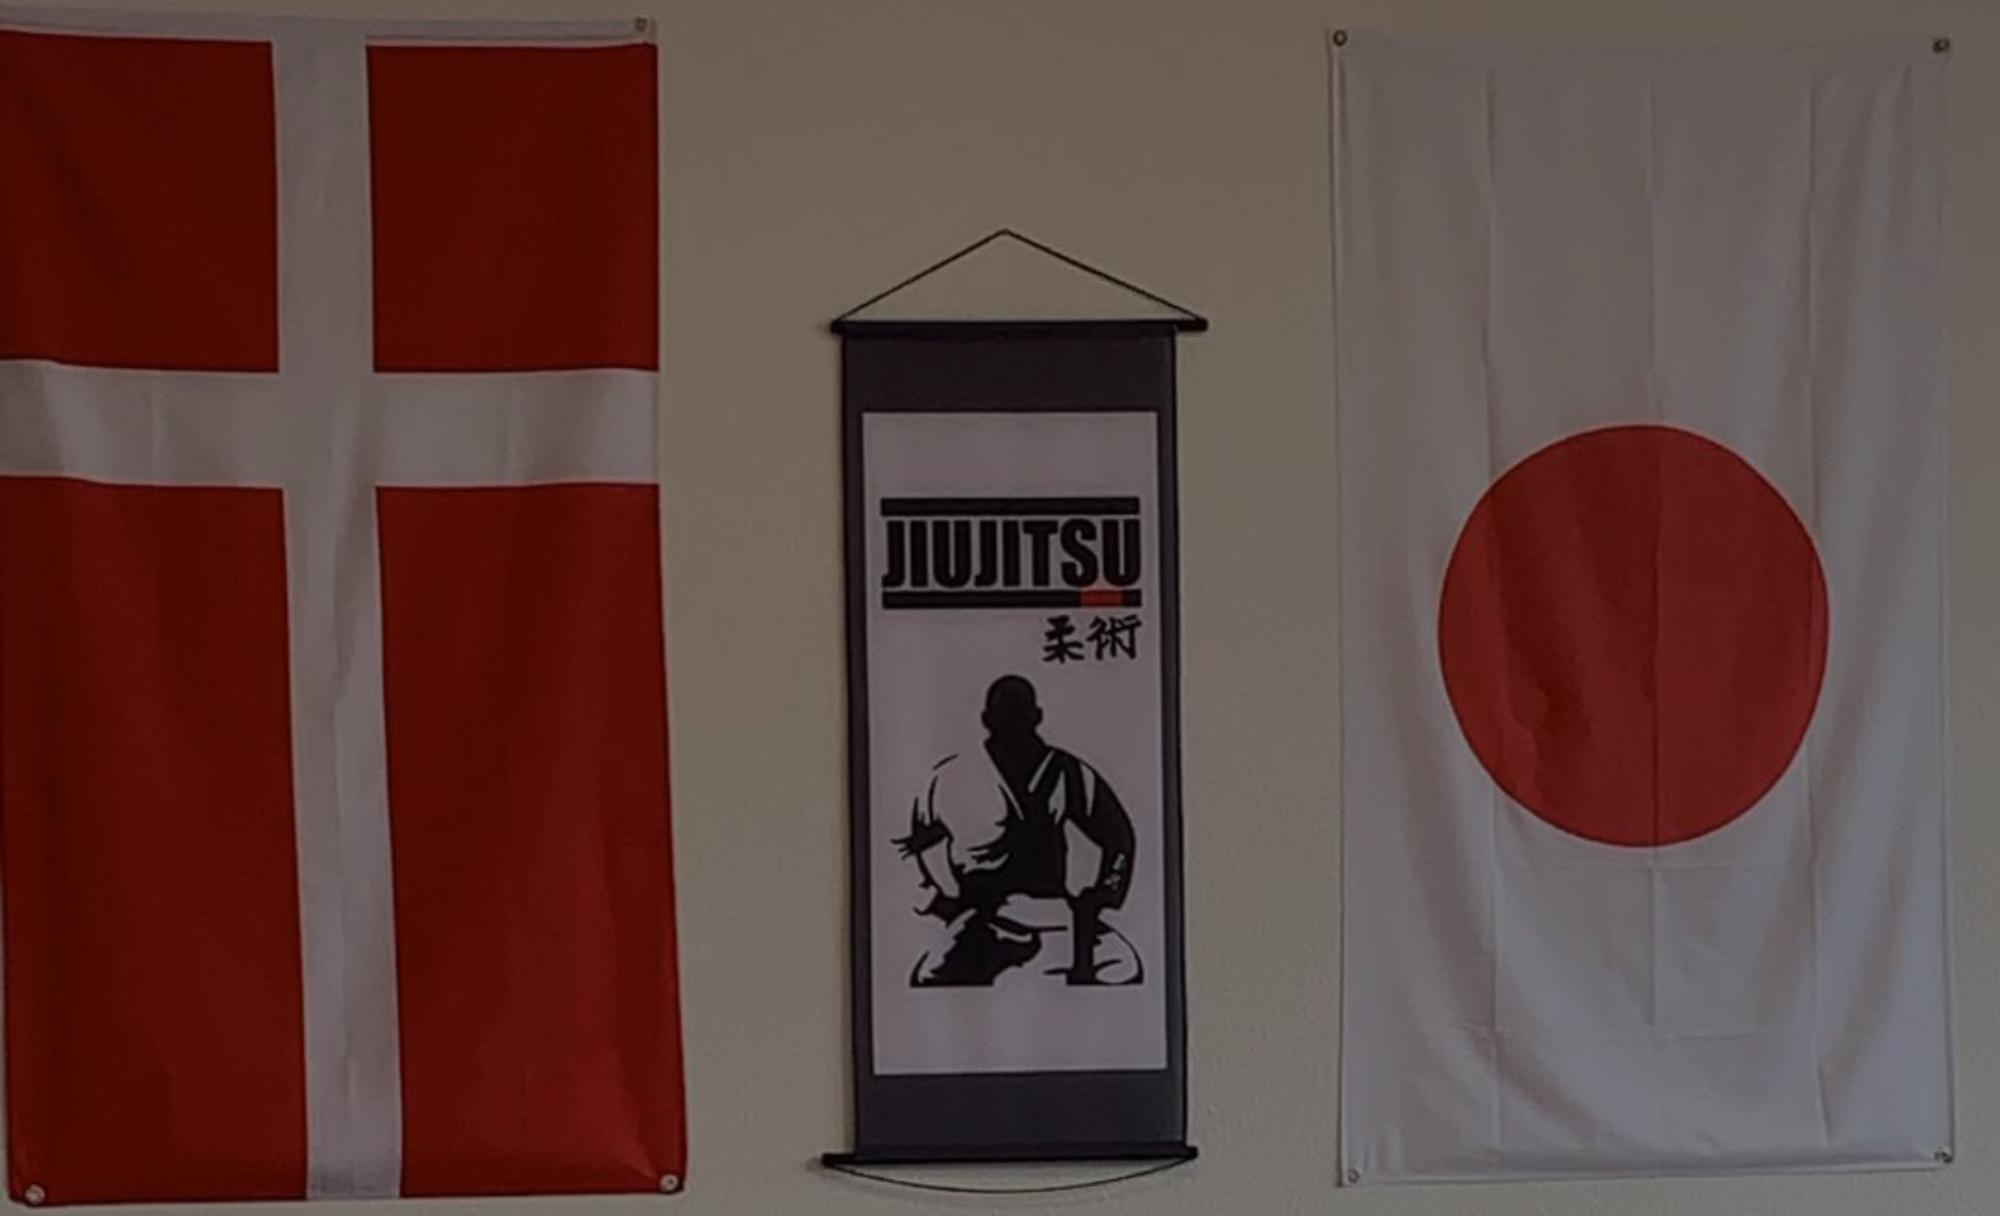 Budokwai Jiu-Jitsu - Selvforsvar & Jiu-Jitsu